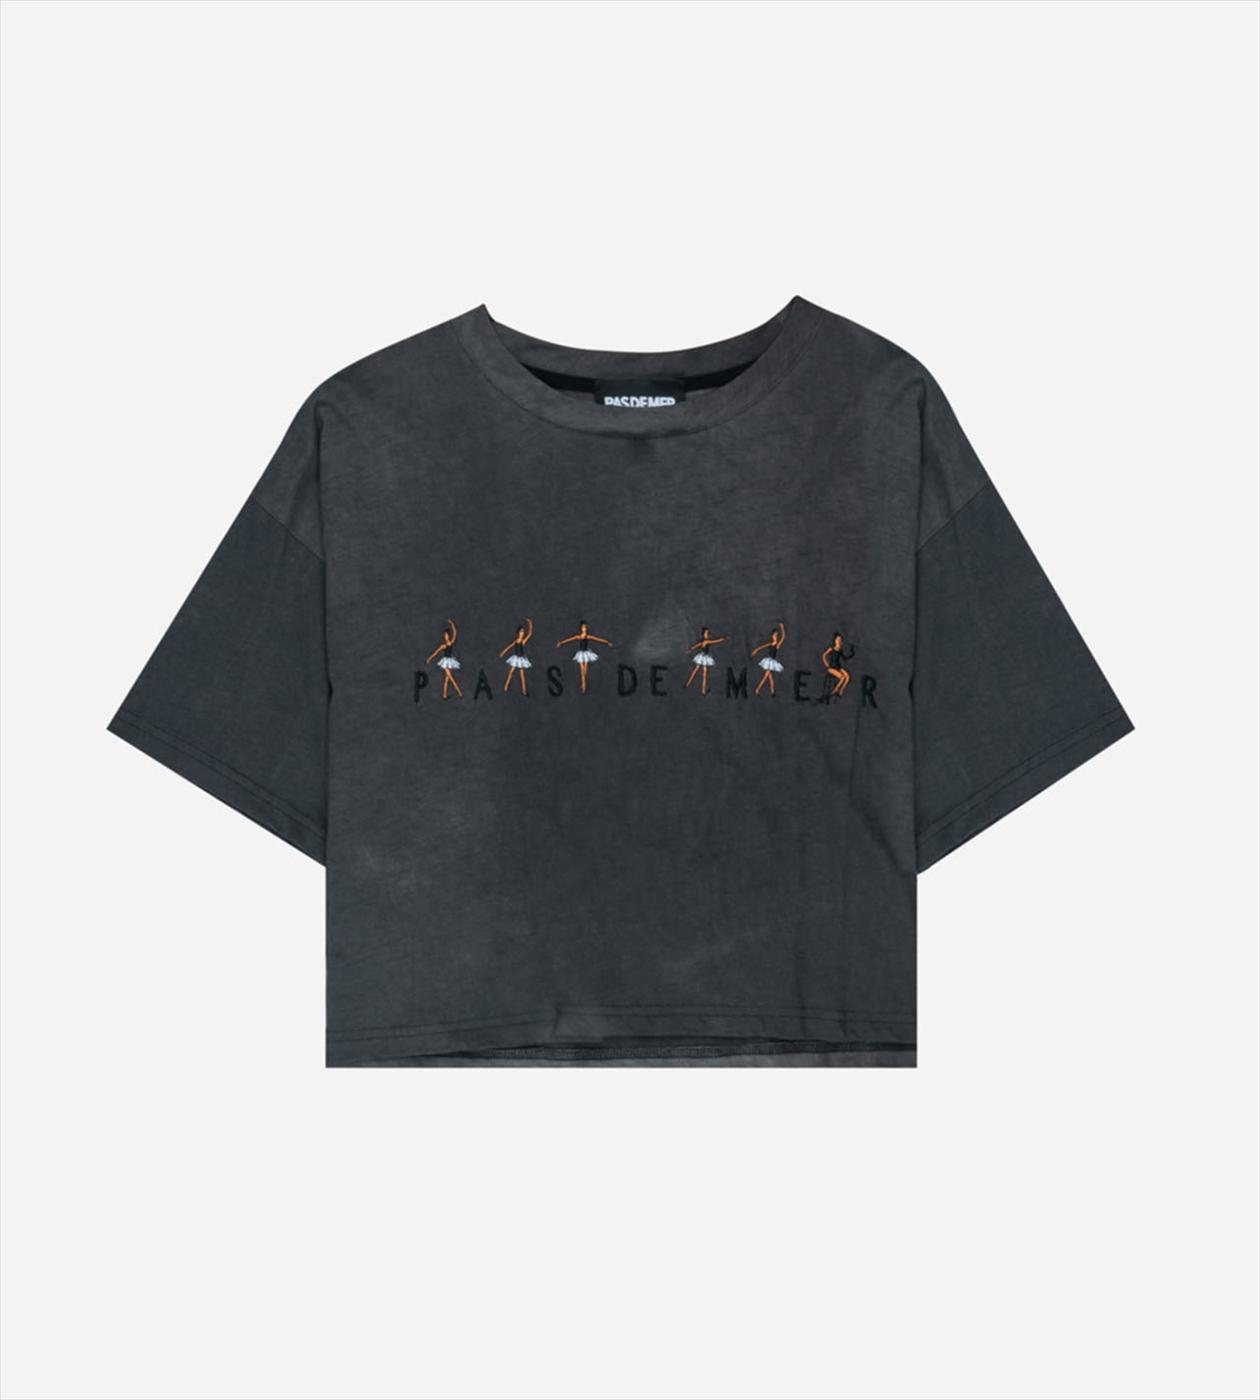 【PAS DE MER/パドゥメ】BALLET CROPPED T-SHIRT ウィメンズクロップドTシャツ / ASPHALT